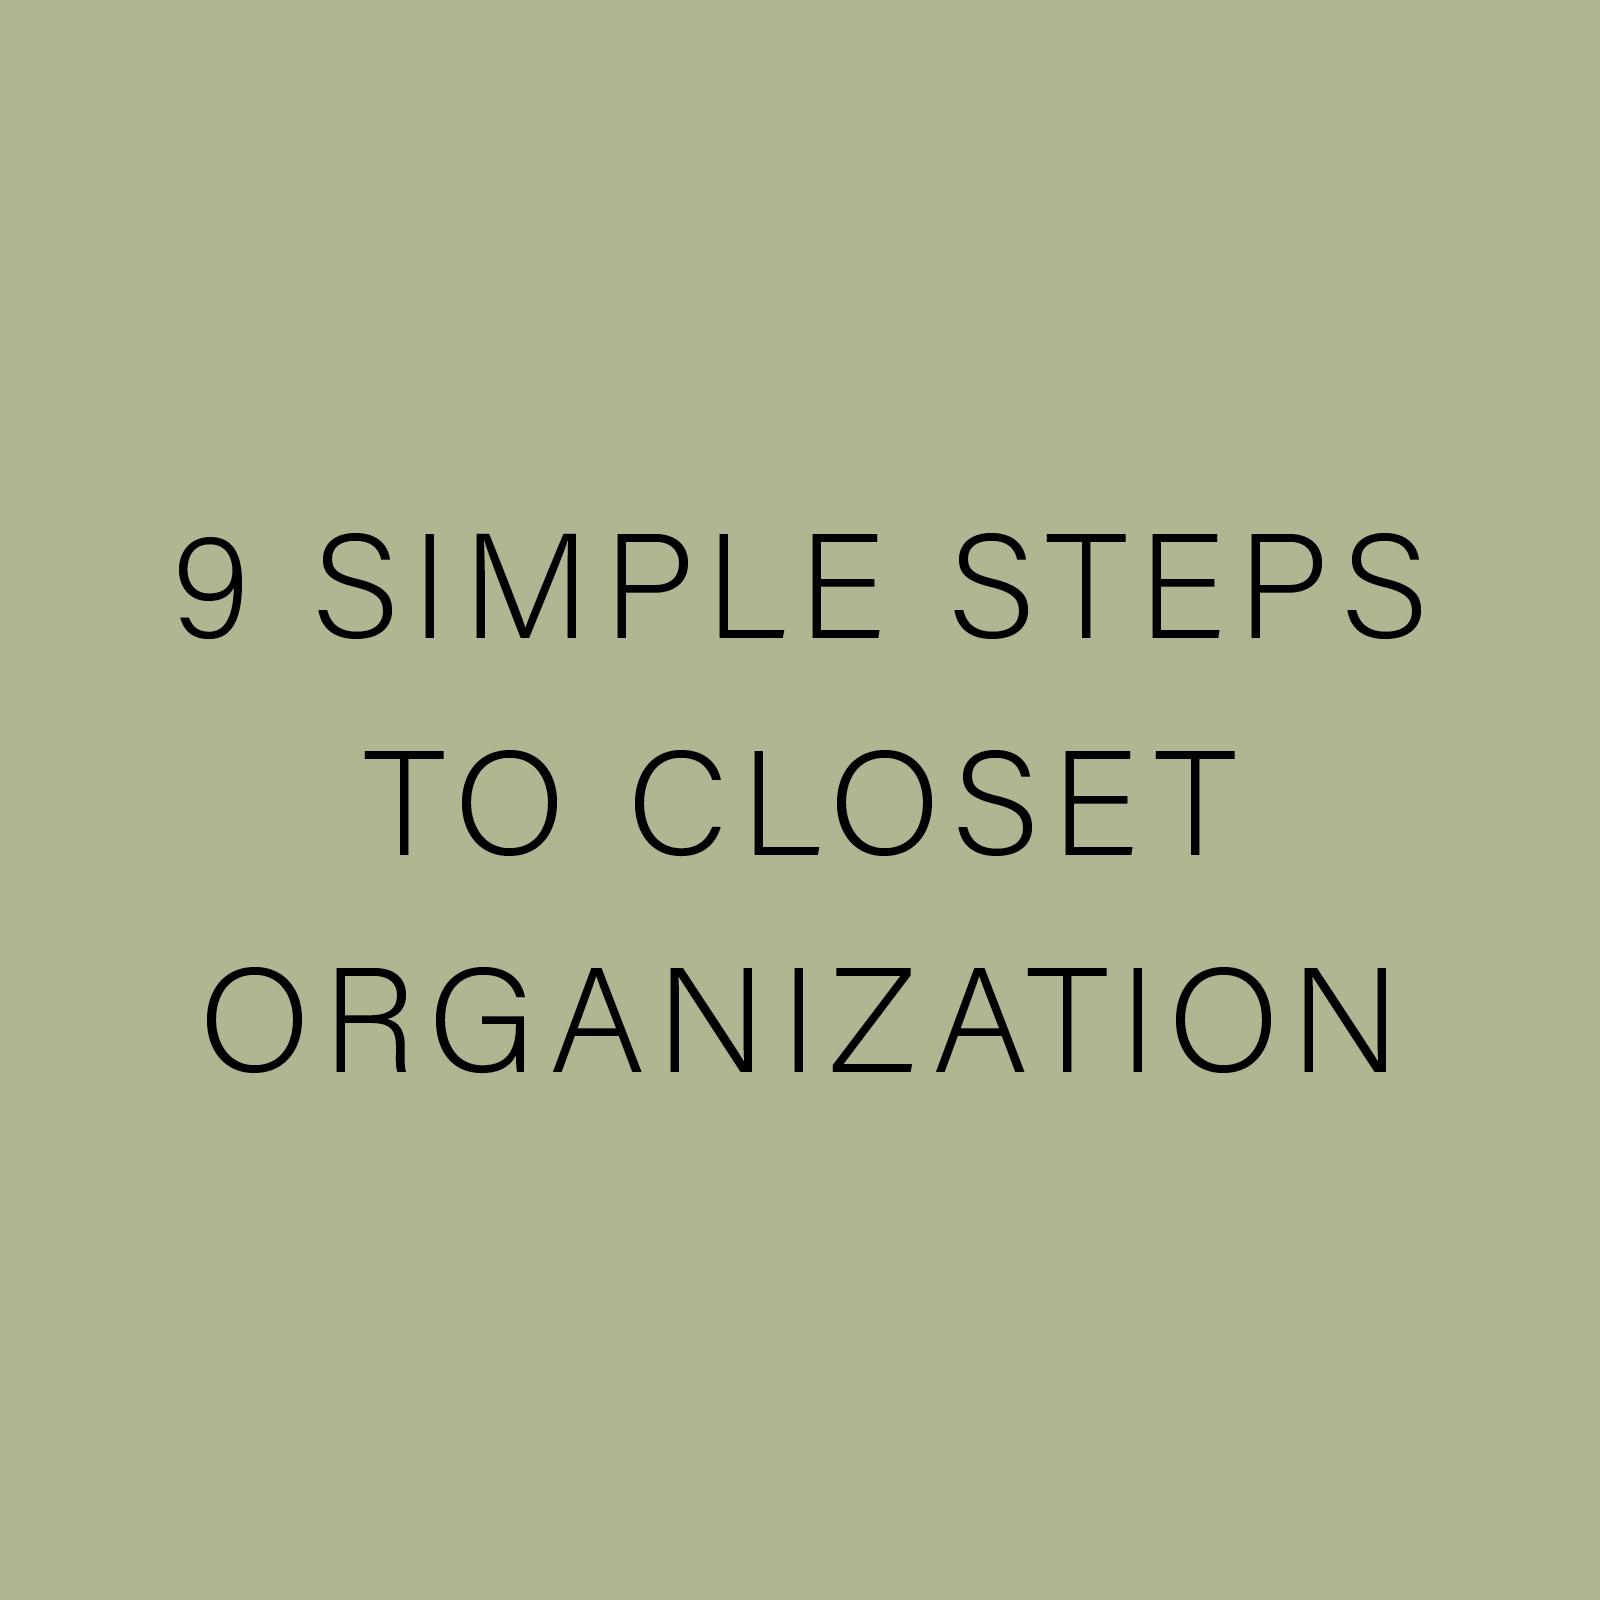 9 SIMPLE STEPS TO CLOSET ORGANIZATION.jpg